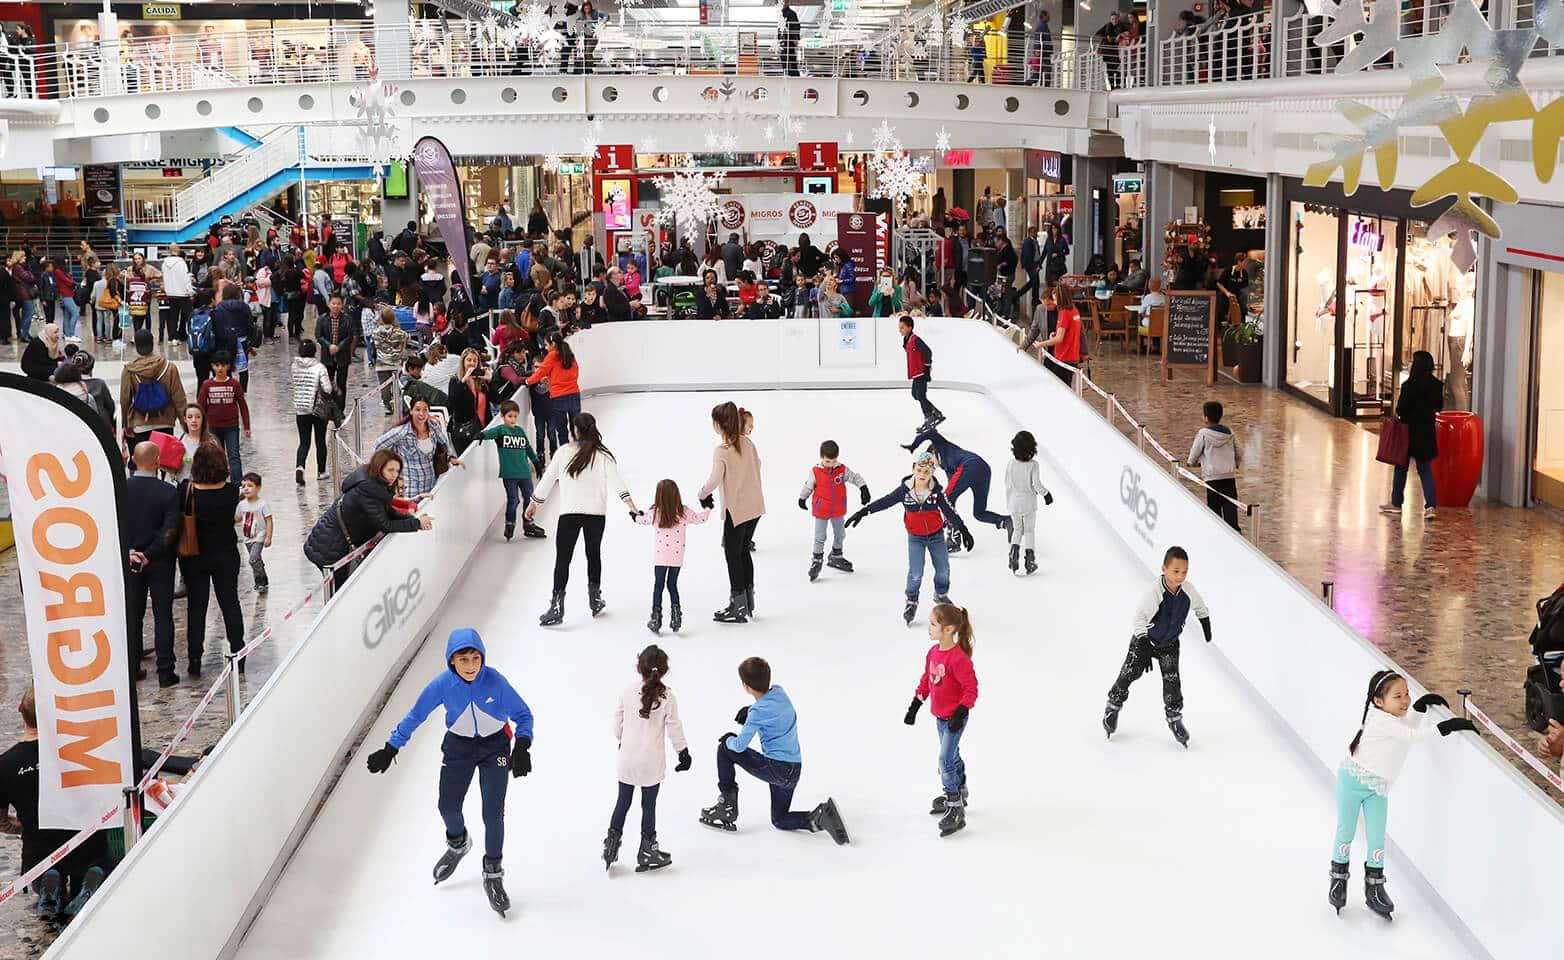 Leisure synthetic ice rink at prestigious German Grand Hotel Heiligendamm